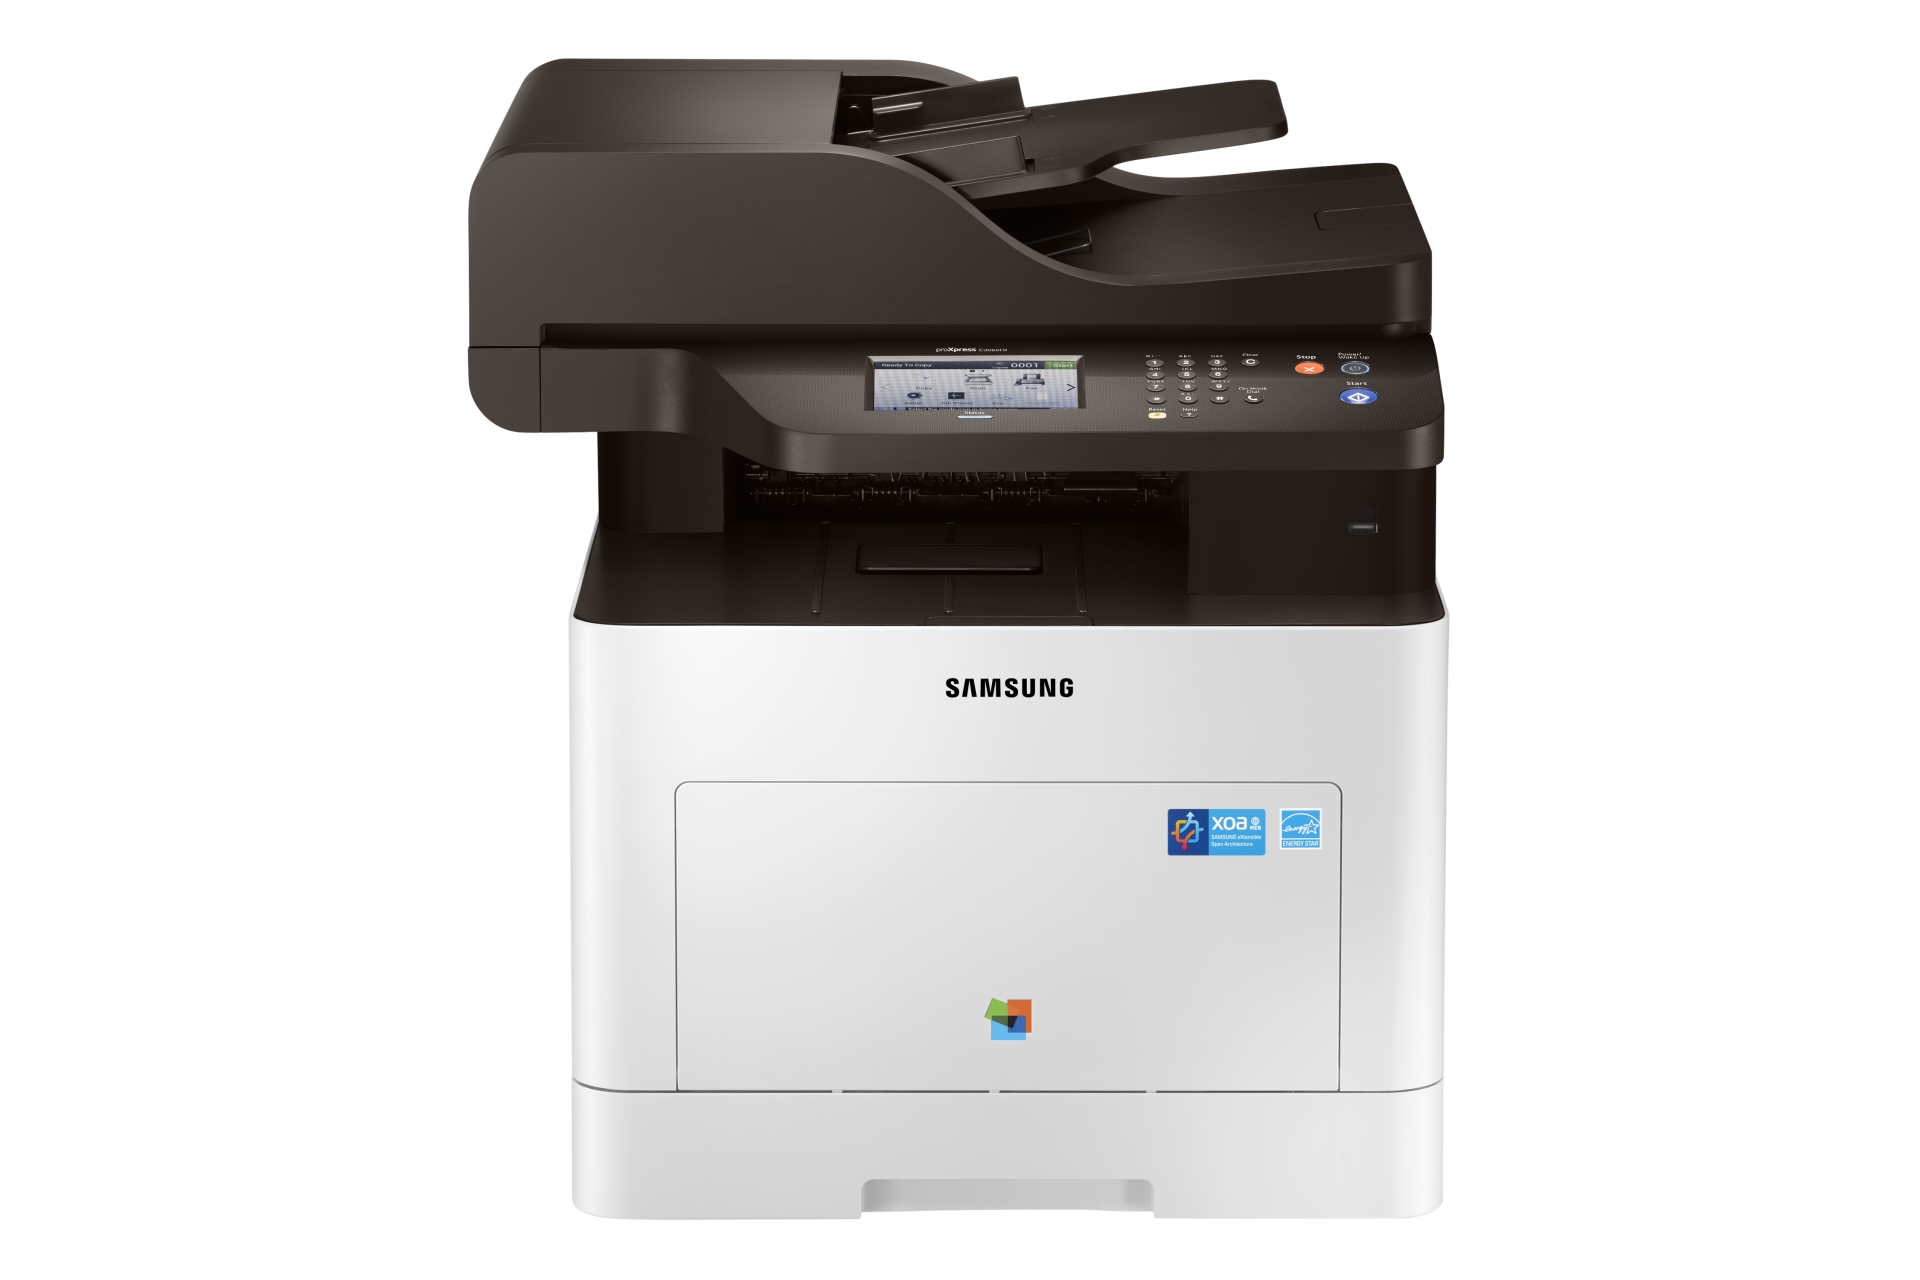 SAMSUNG ProXpress C3060FR ColorLaser MFP printeris